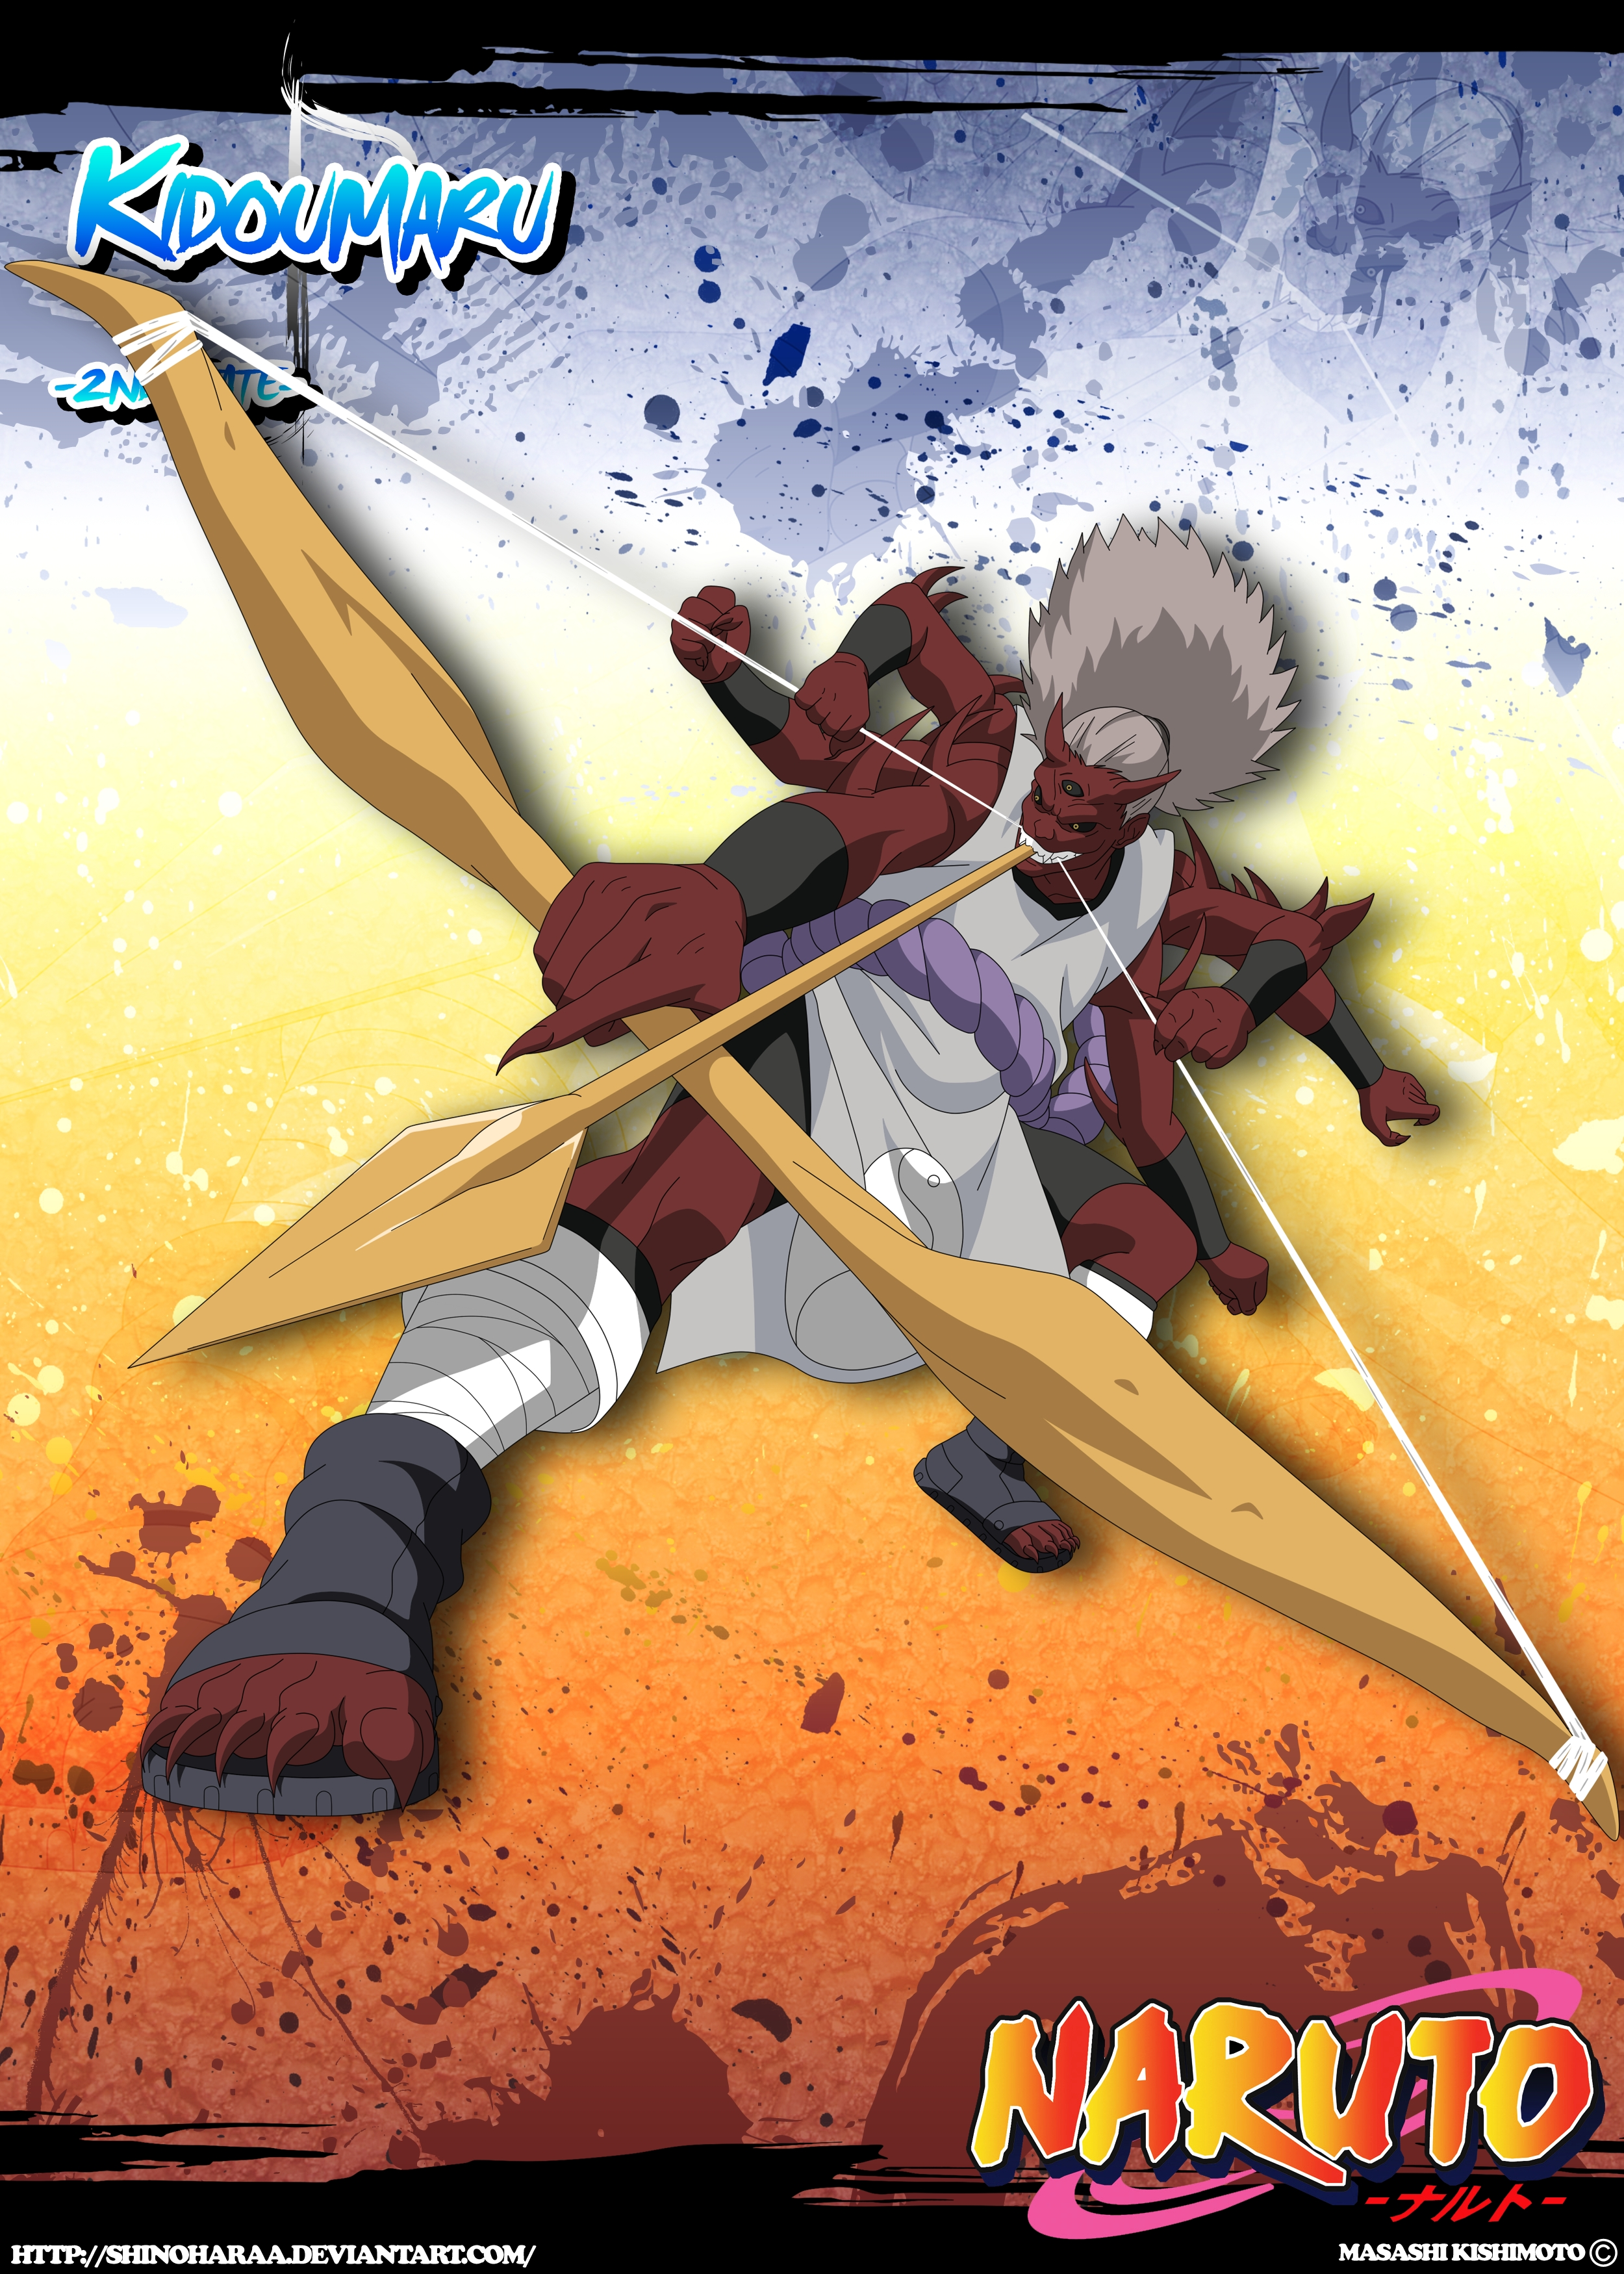 Sound Ninja Five Naruto Zerochan Anime Image Board